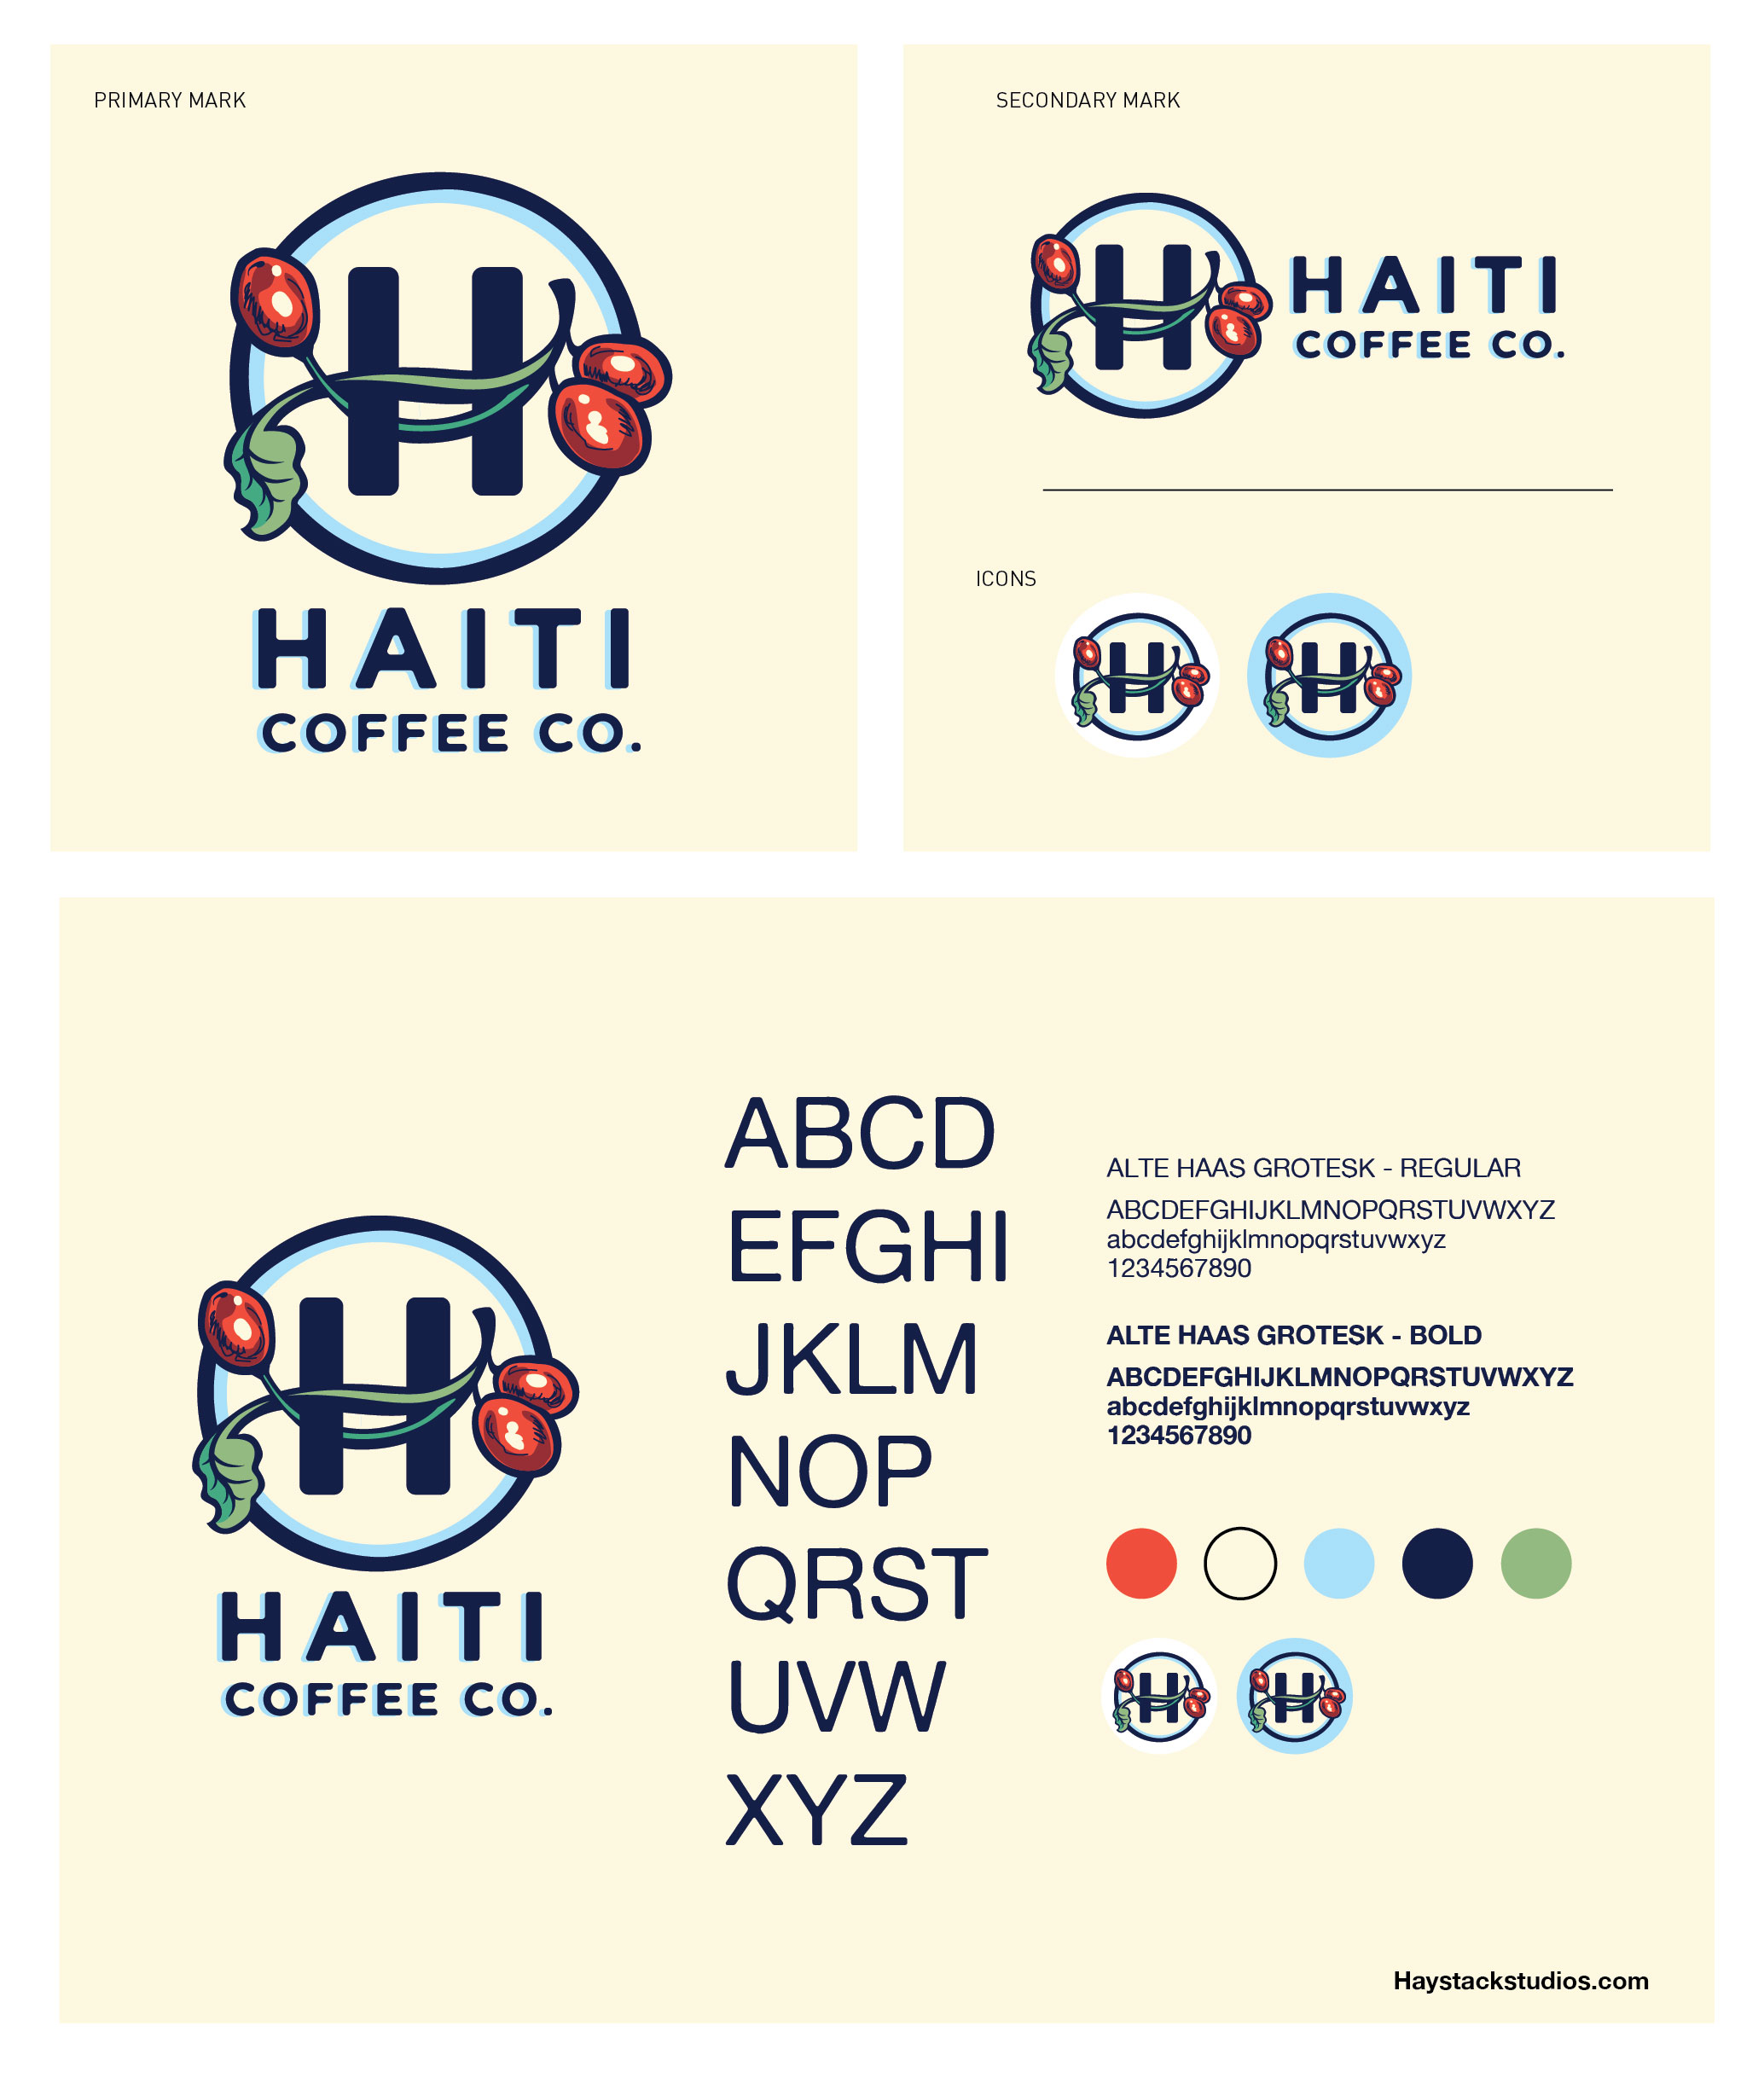 HaitiCoffeeCo_splashpg-03.jpg